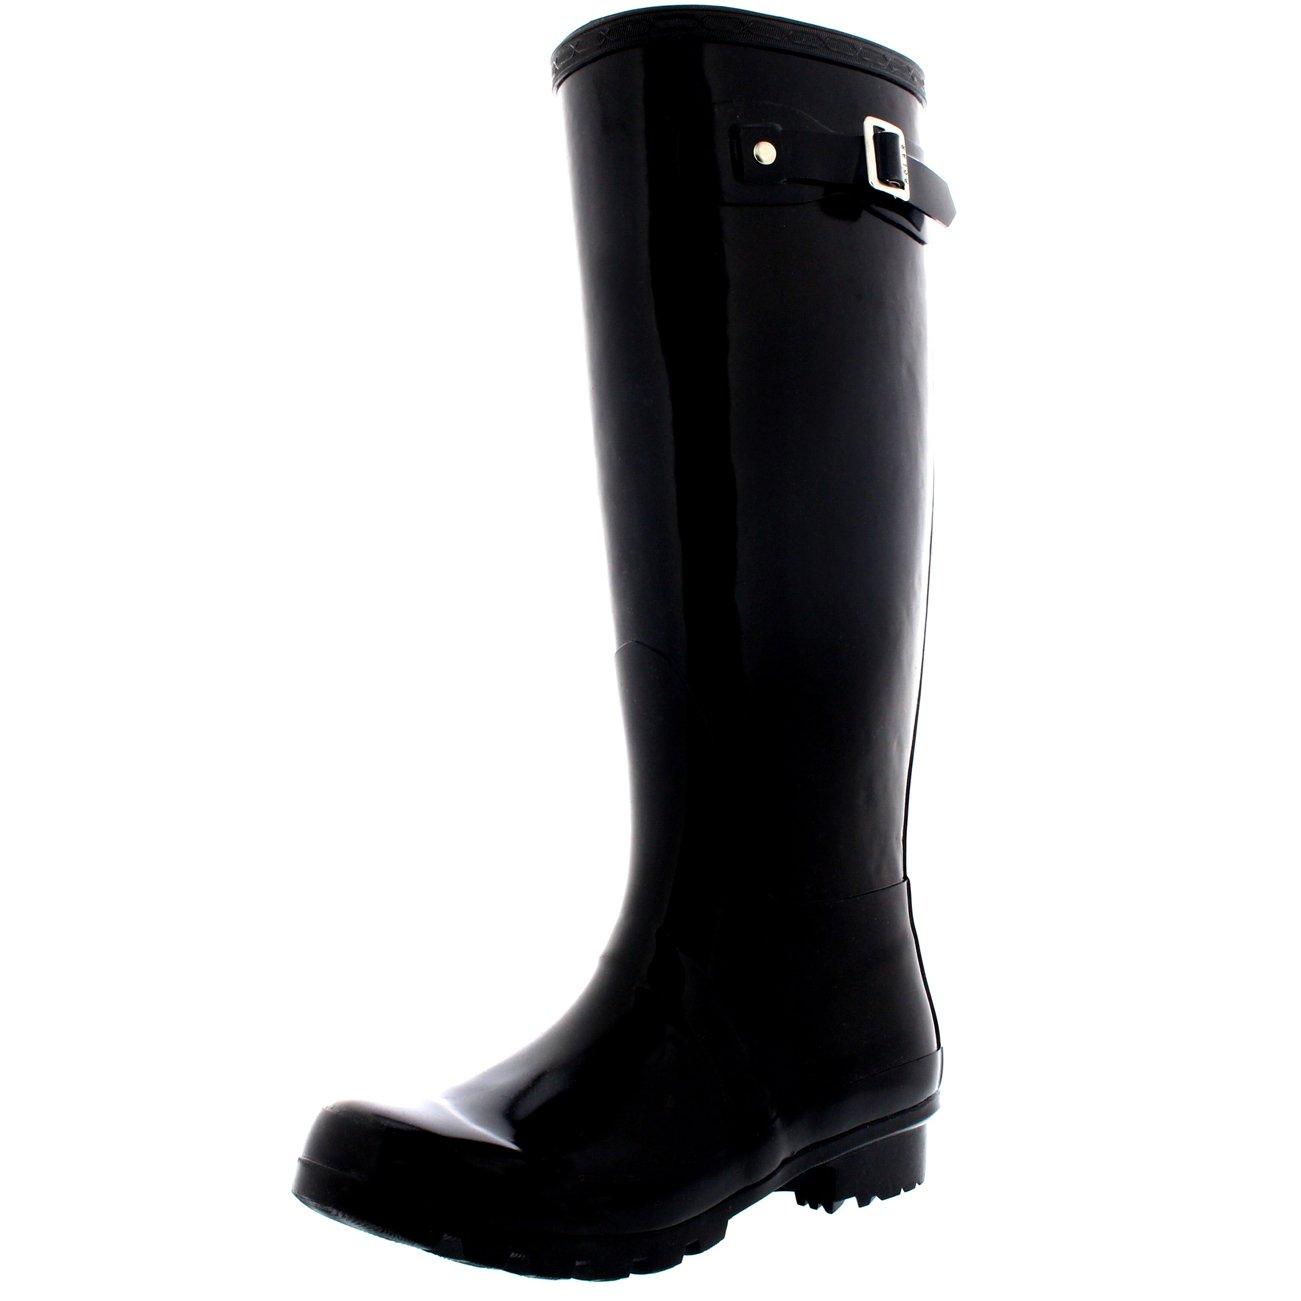 Womens Original Tall Gloss Winter Waterproof Wellie Rain Wellington Boot - Black - 9-40 - CD0007